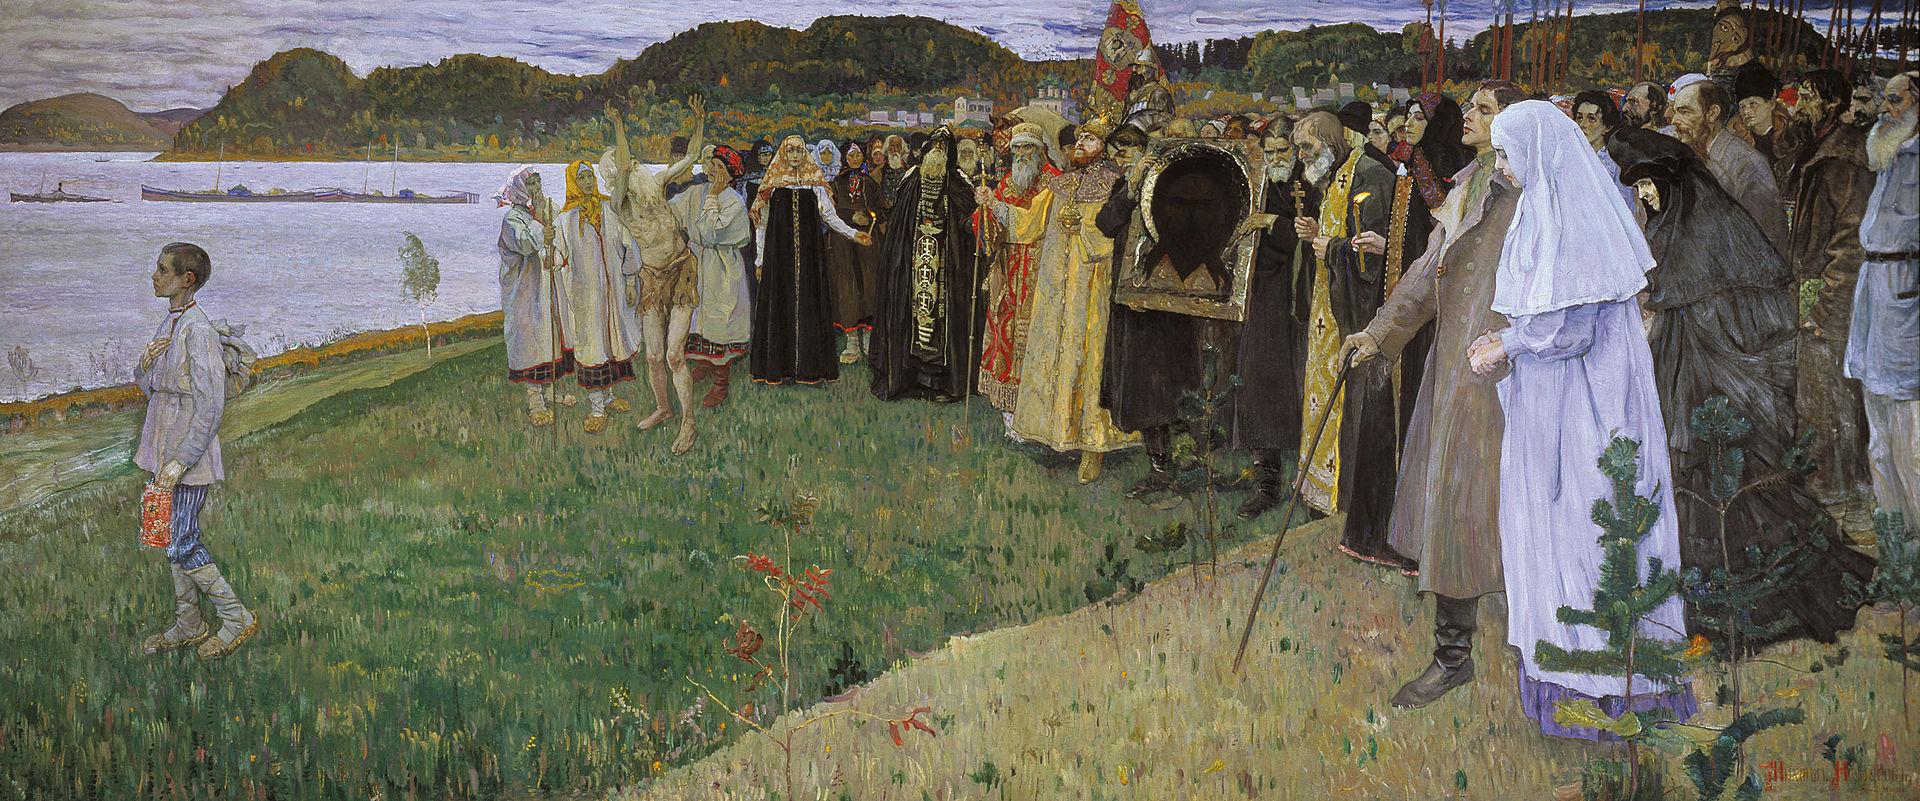 Душа народа или На Руси 915-1916